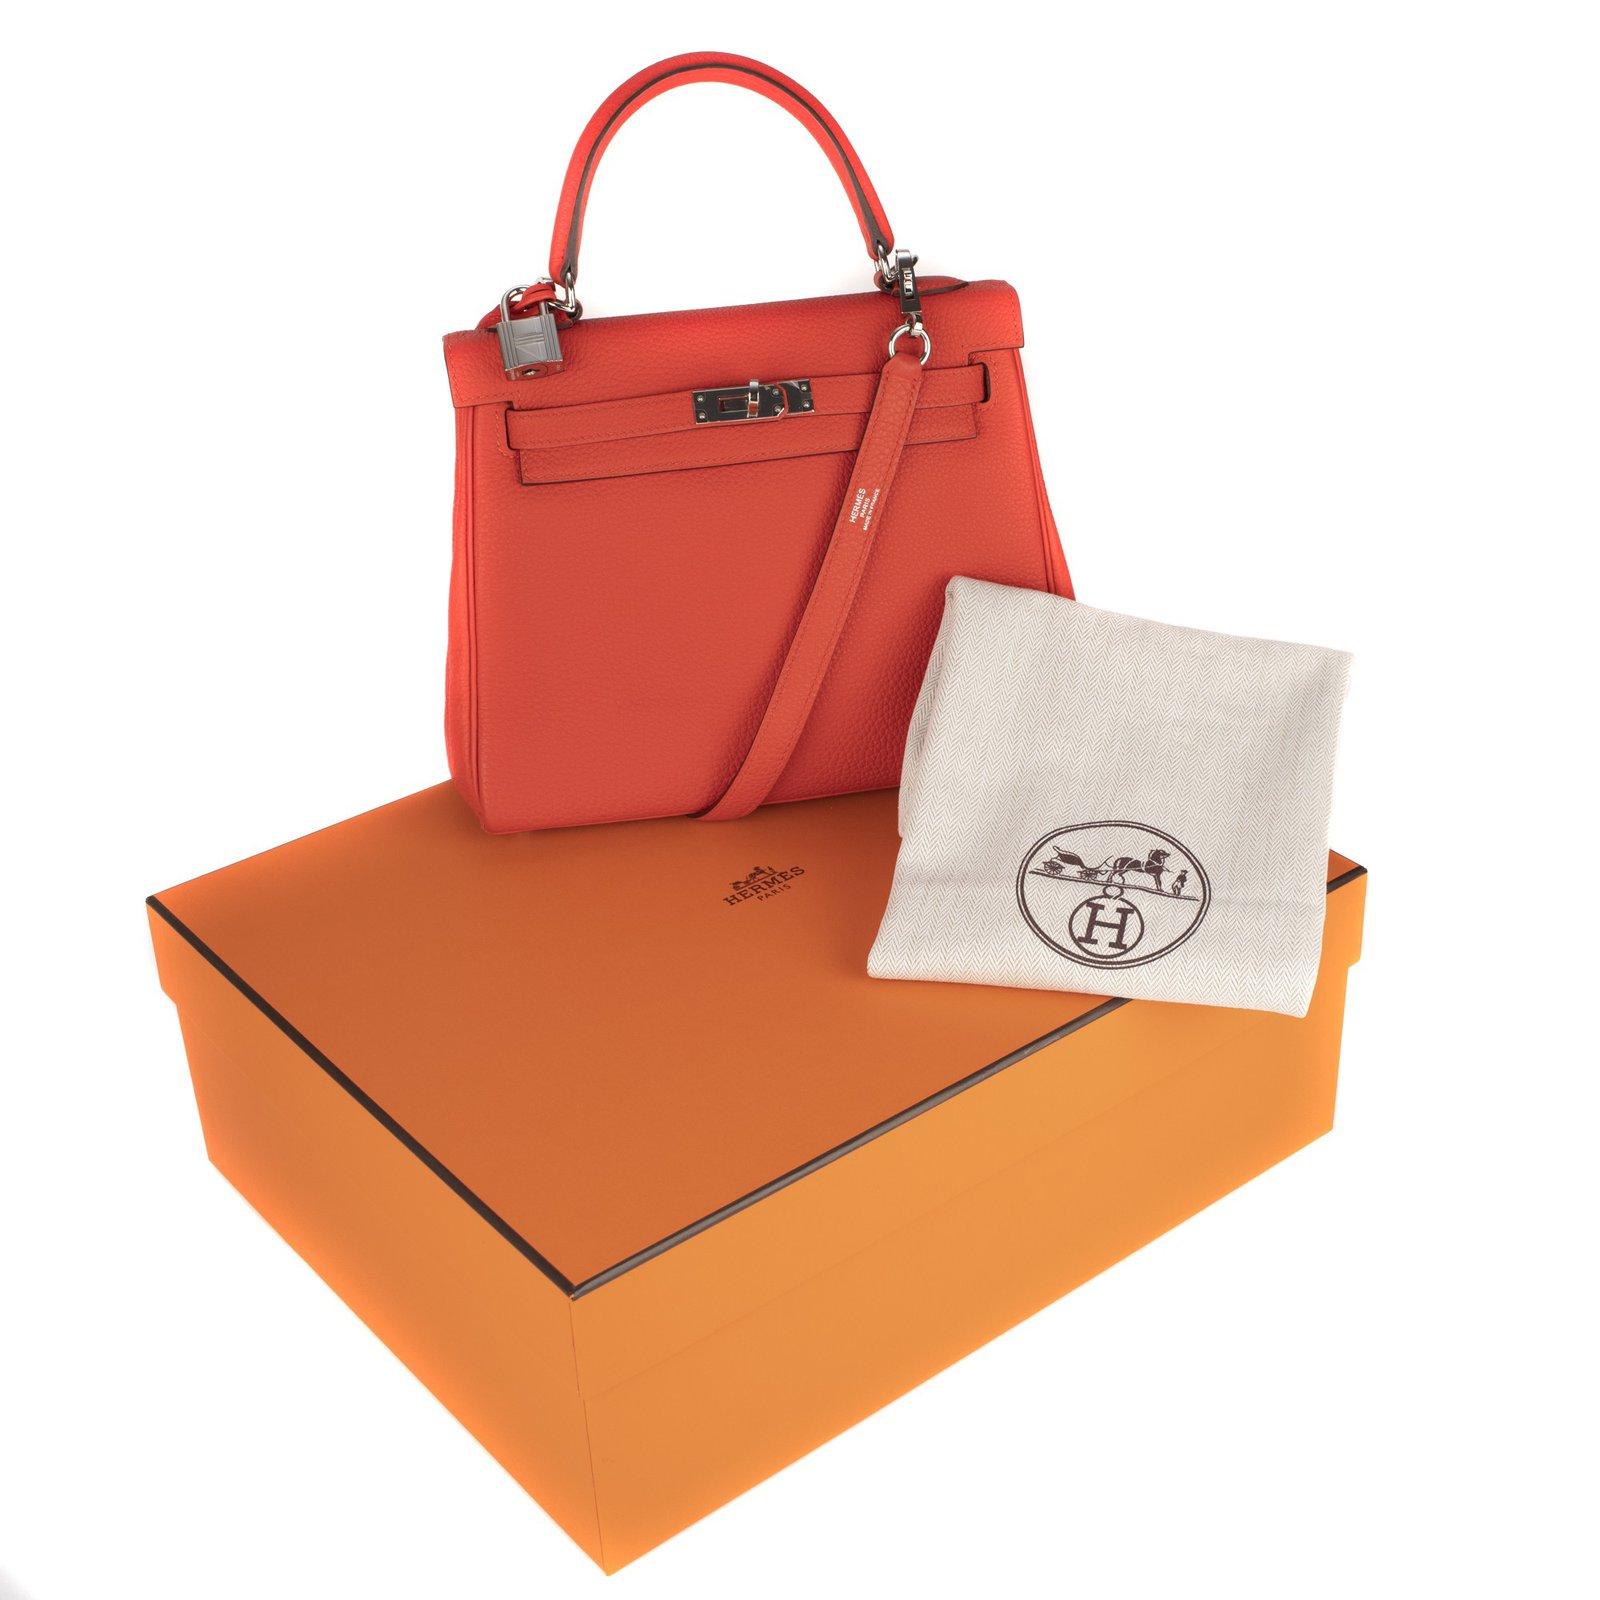 64f0b3e0dd4e Hermès Superb Hermes Kelly 25 Togo red leather